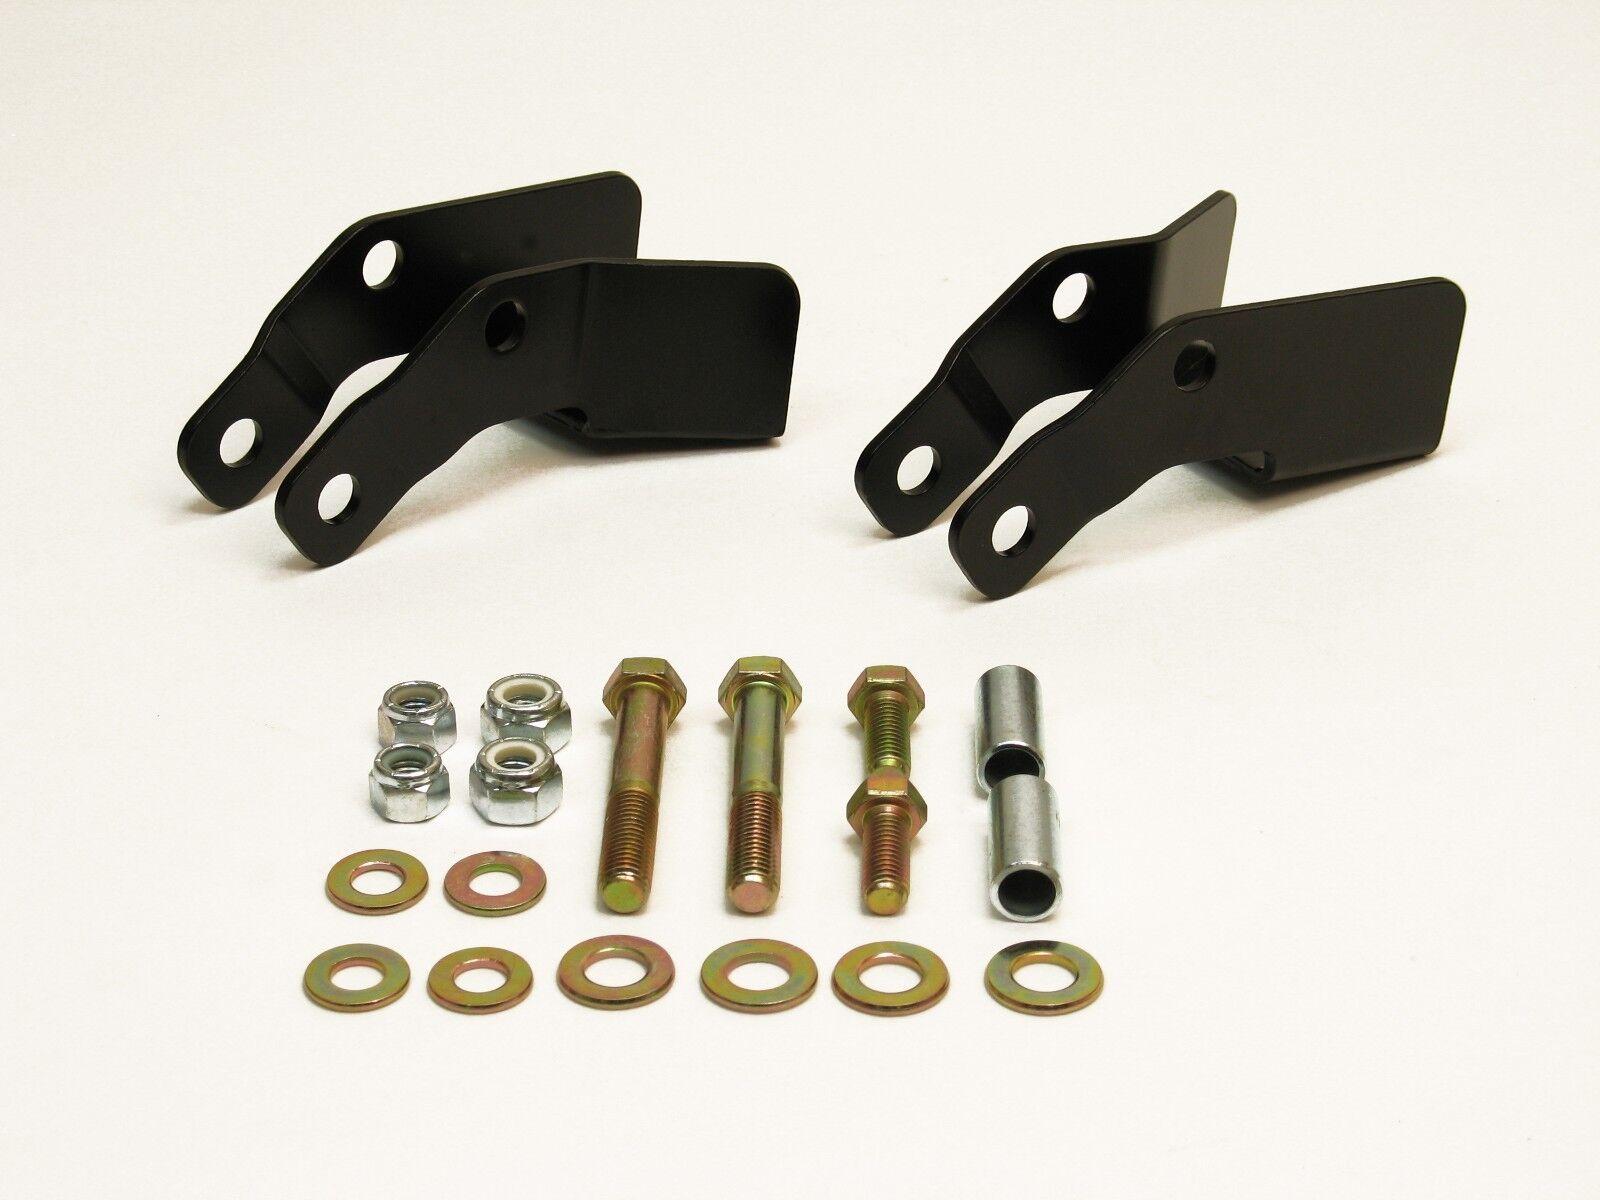 Belltech 95-99 Chevy Suburban Rear Shock Extensions